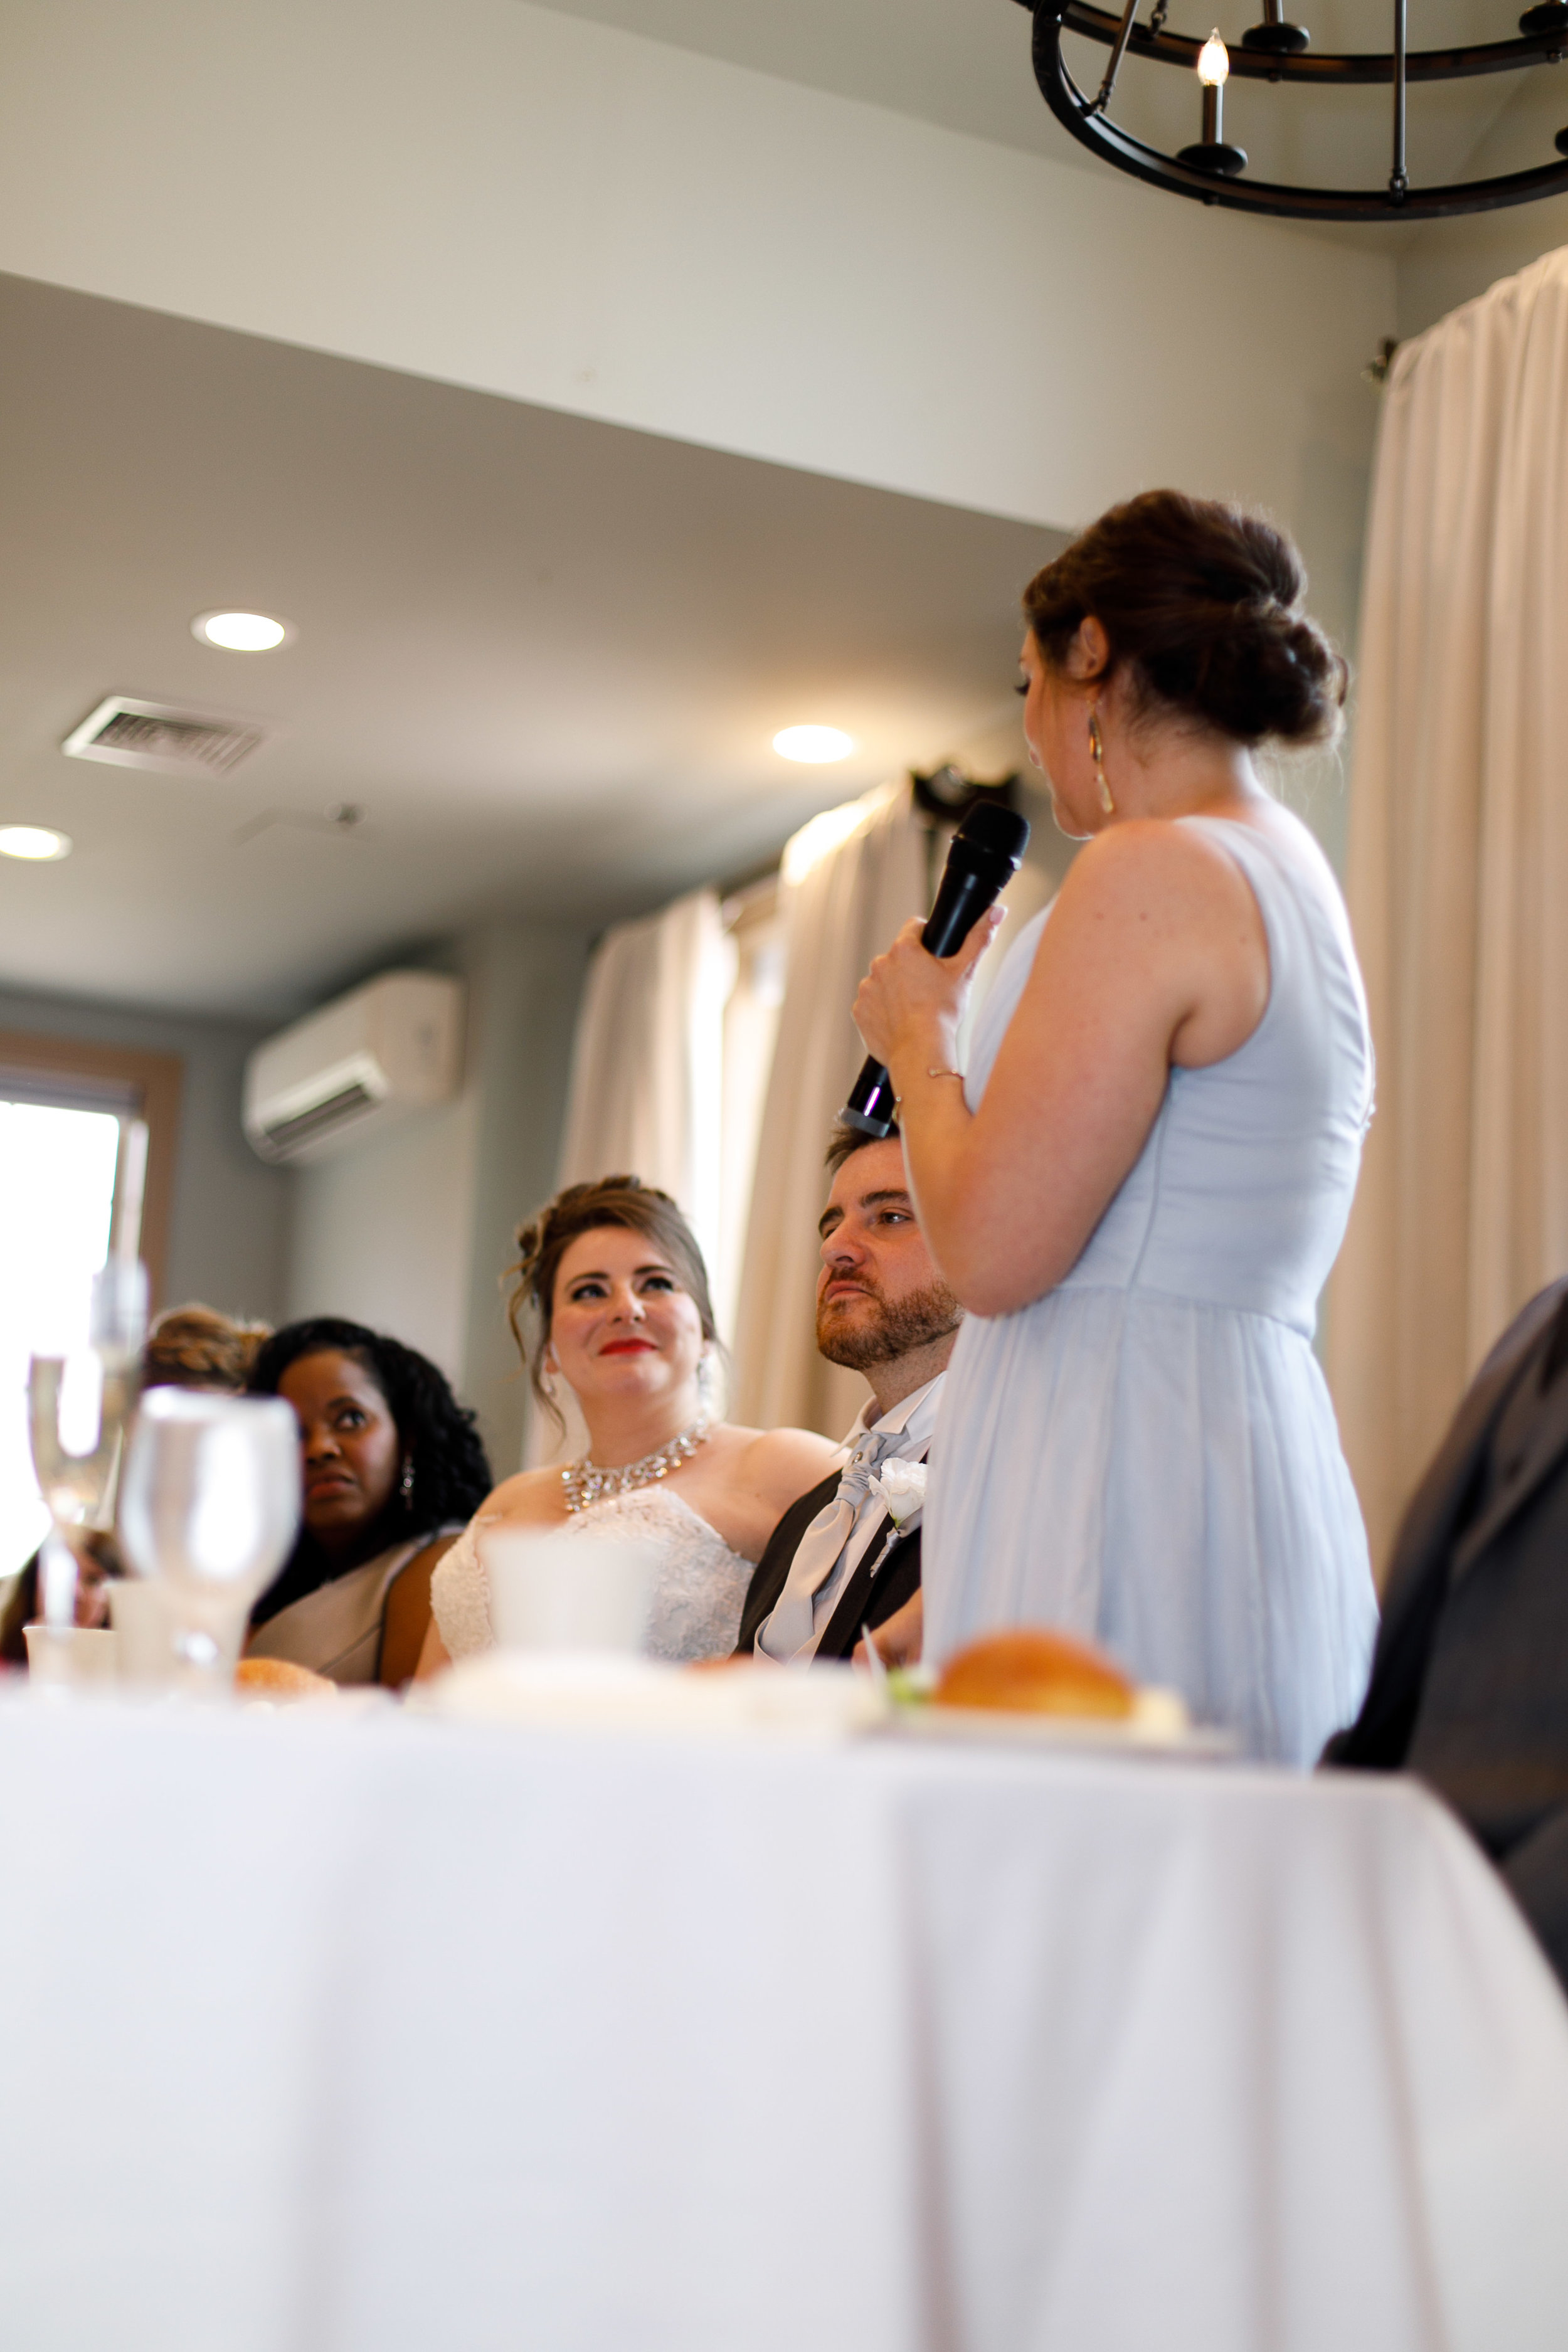 Wedding at Joseph Ambler In Bucks County PA39.jpg